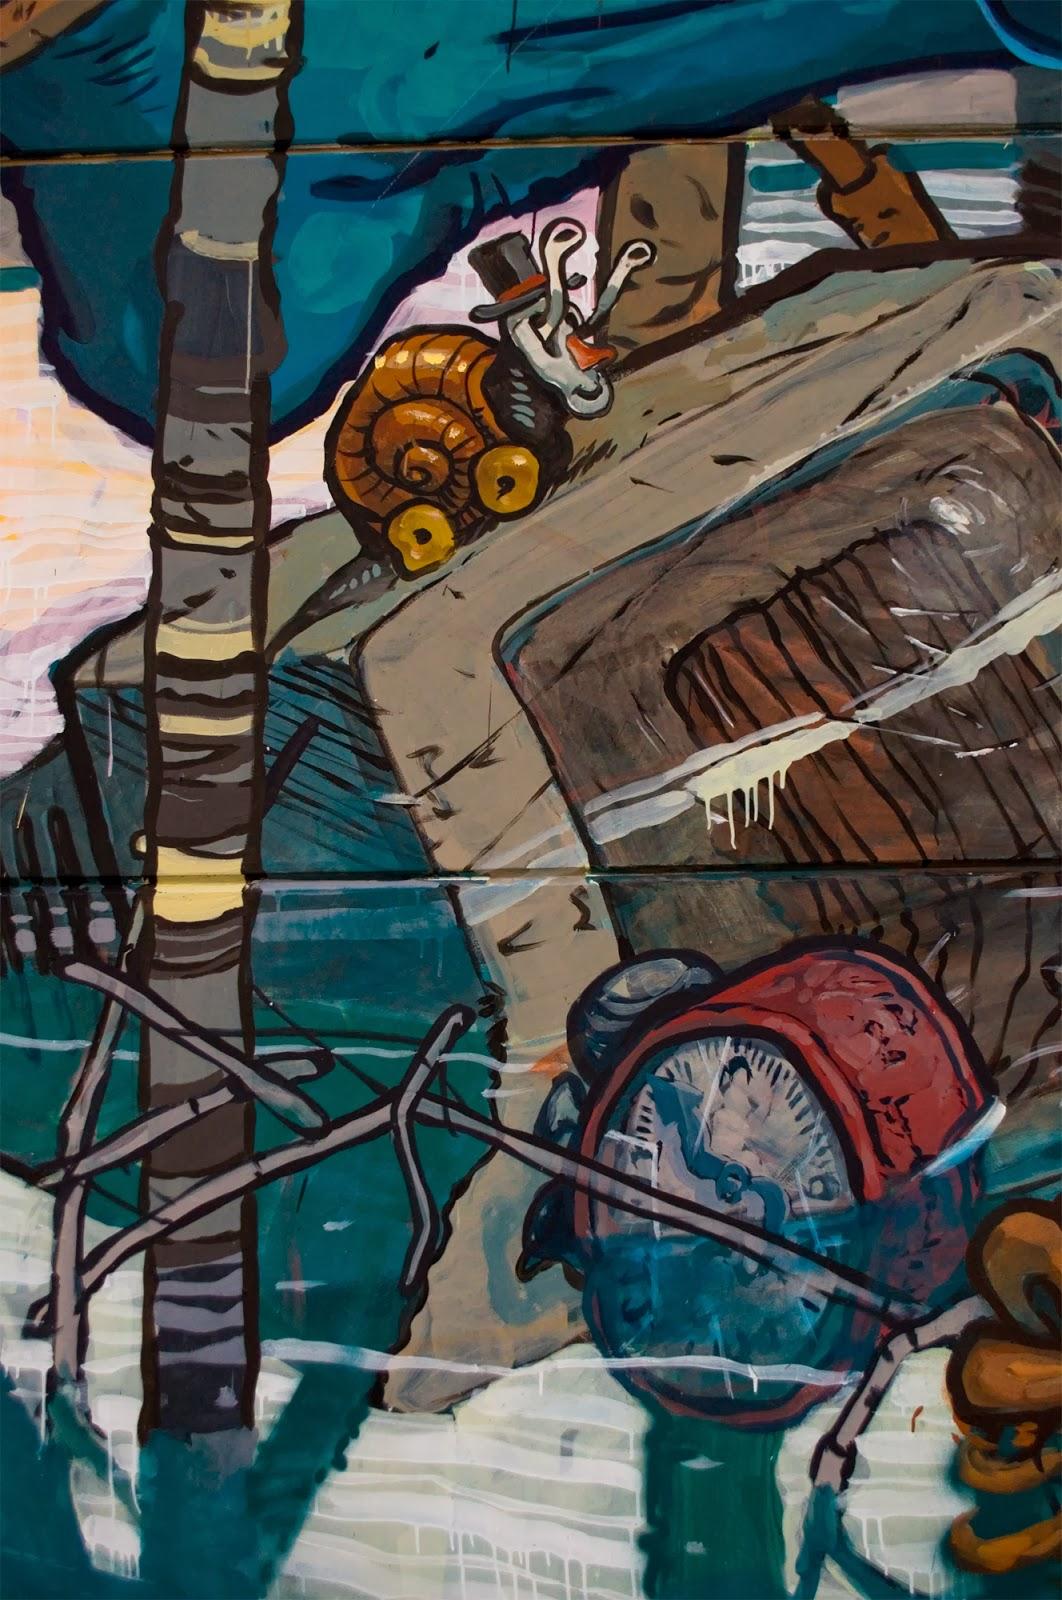 Riquiño-new-mural-at-desordes-creativas-2013-10